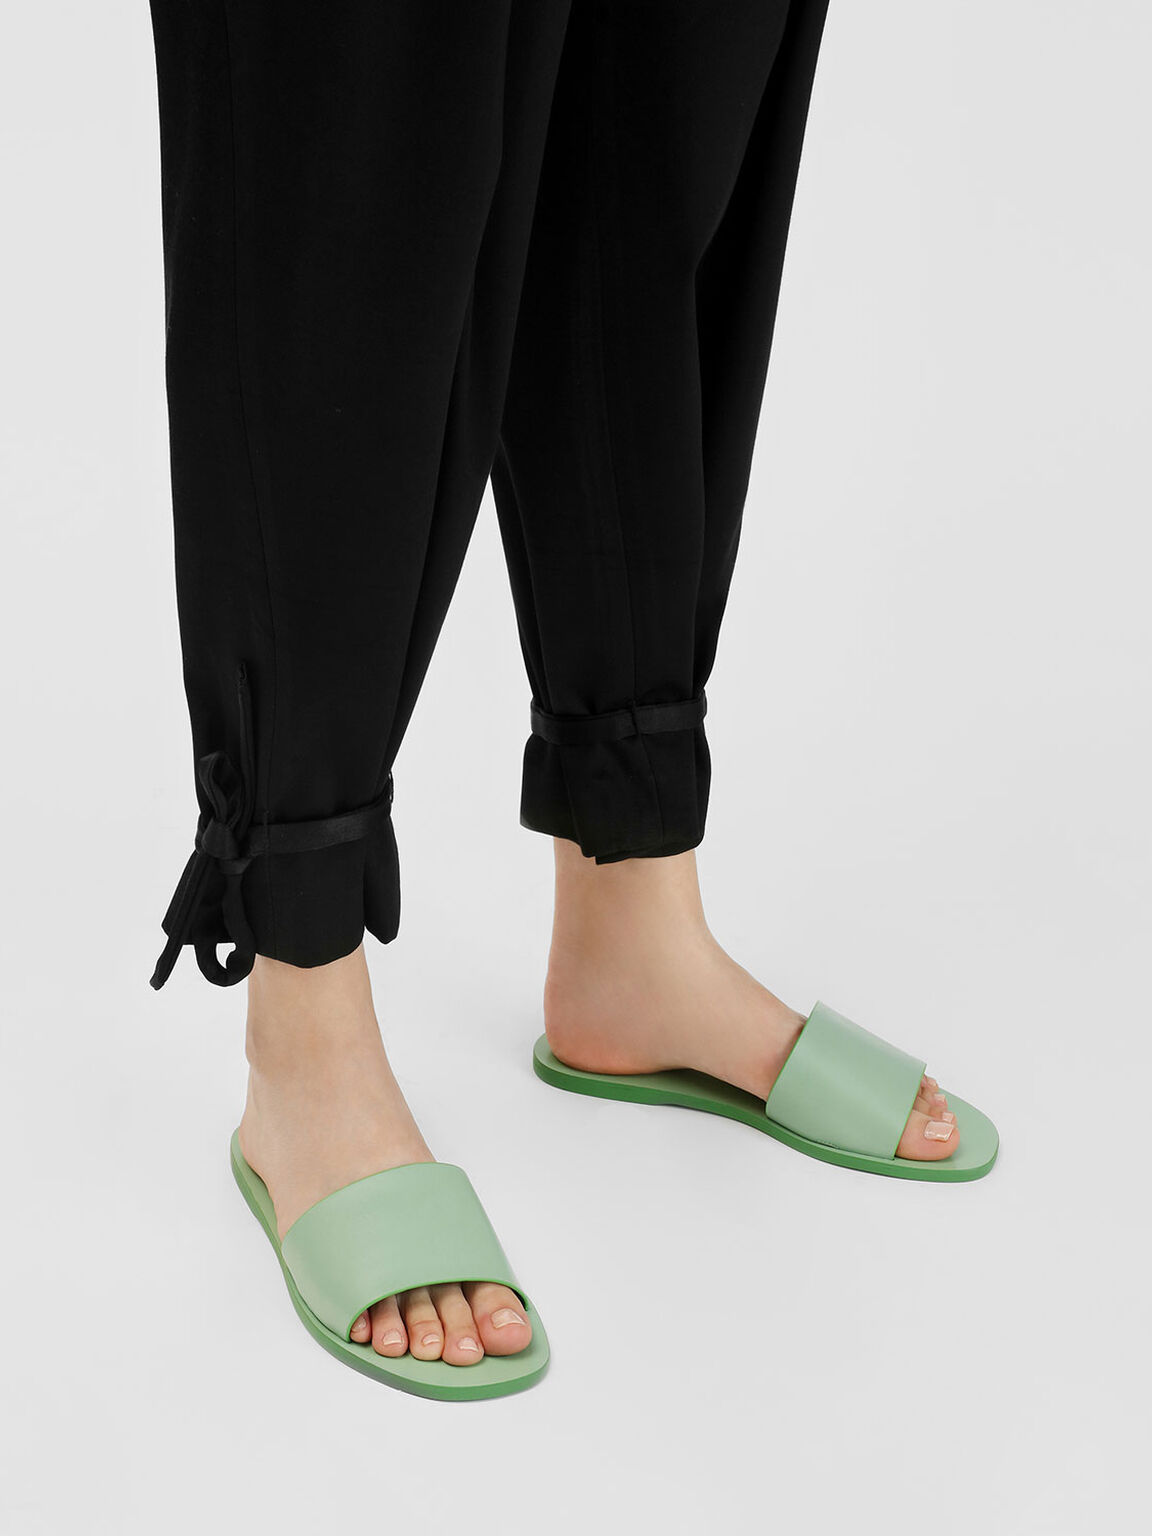 Candy Coloured Sliders, Sage Green, hi-res